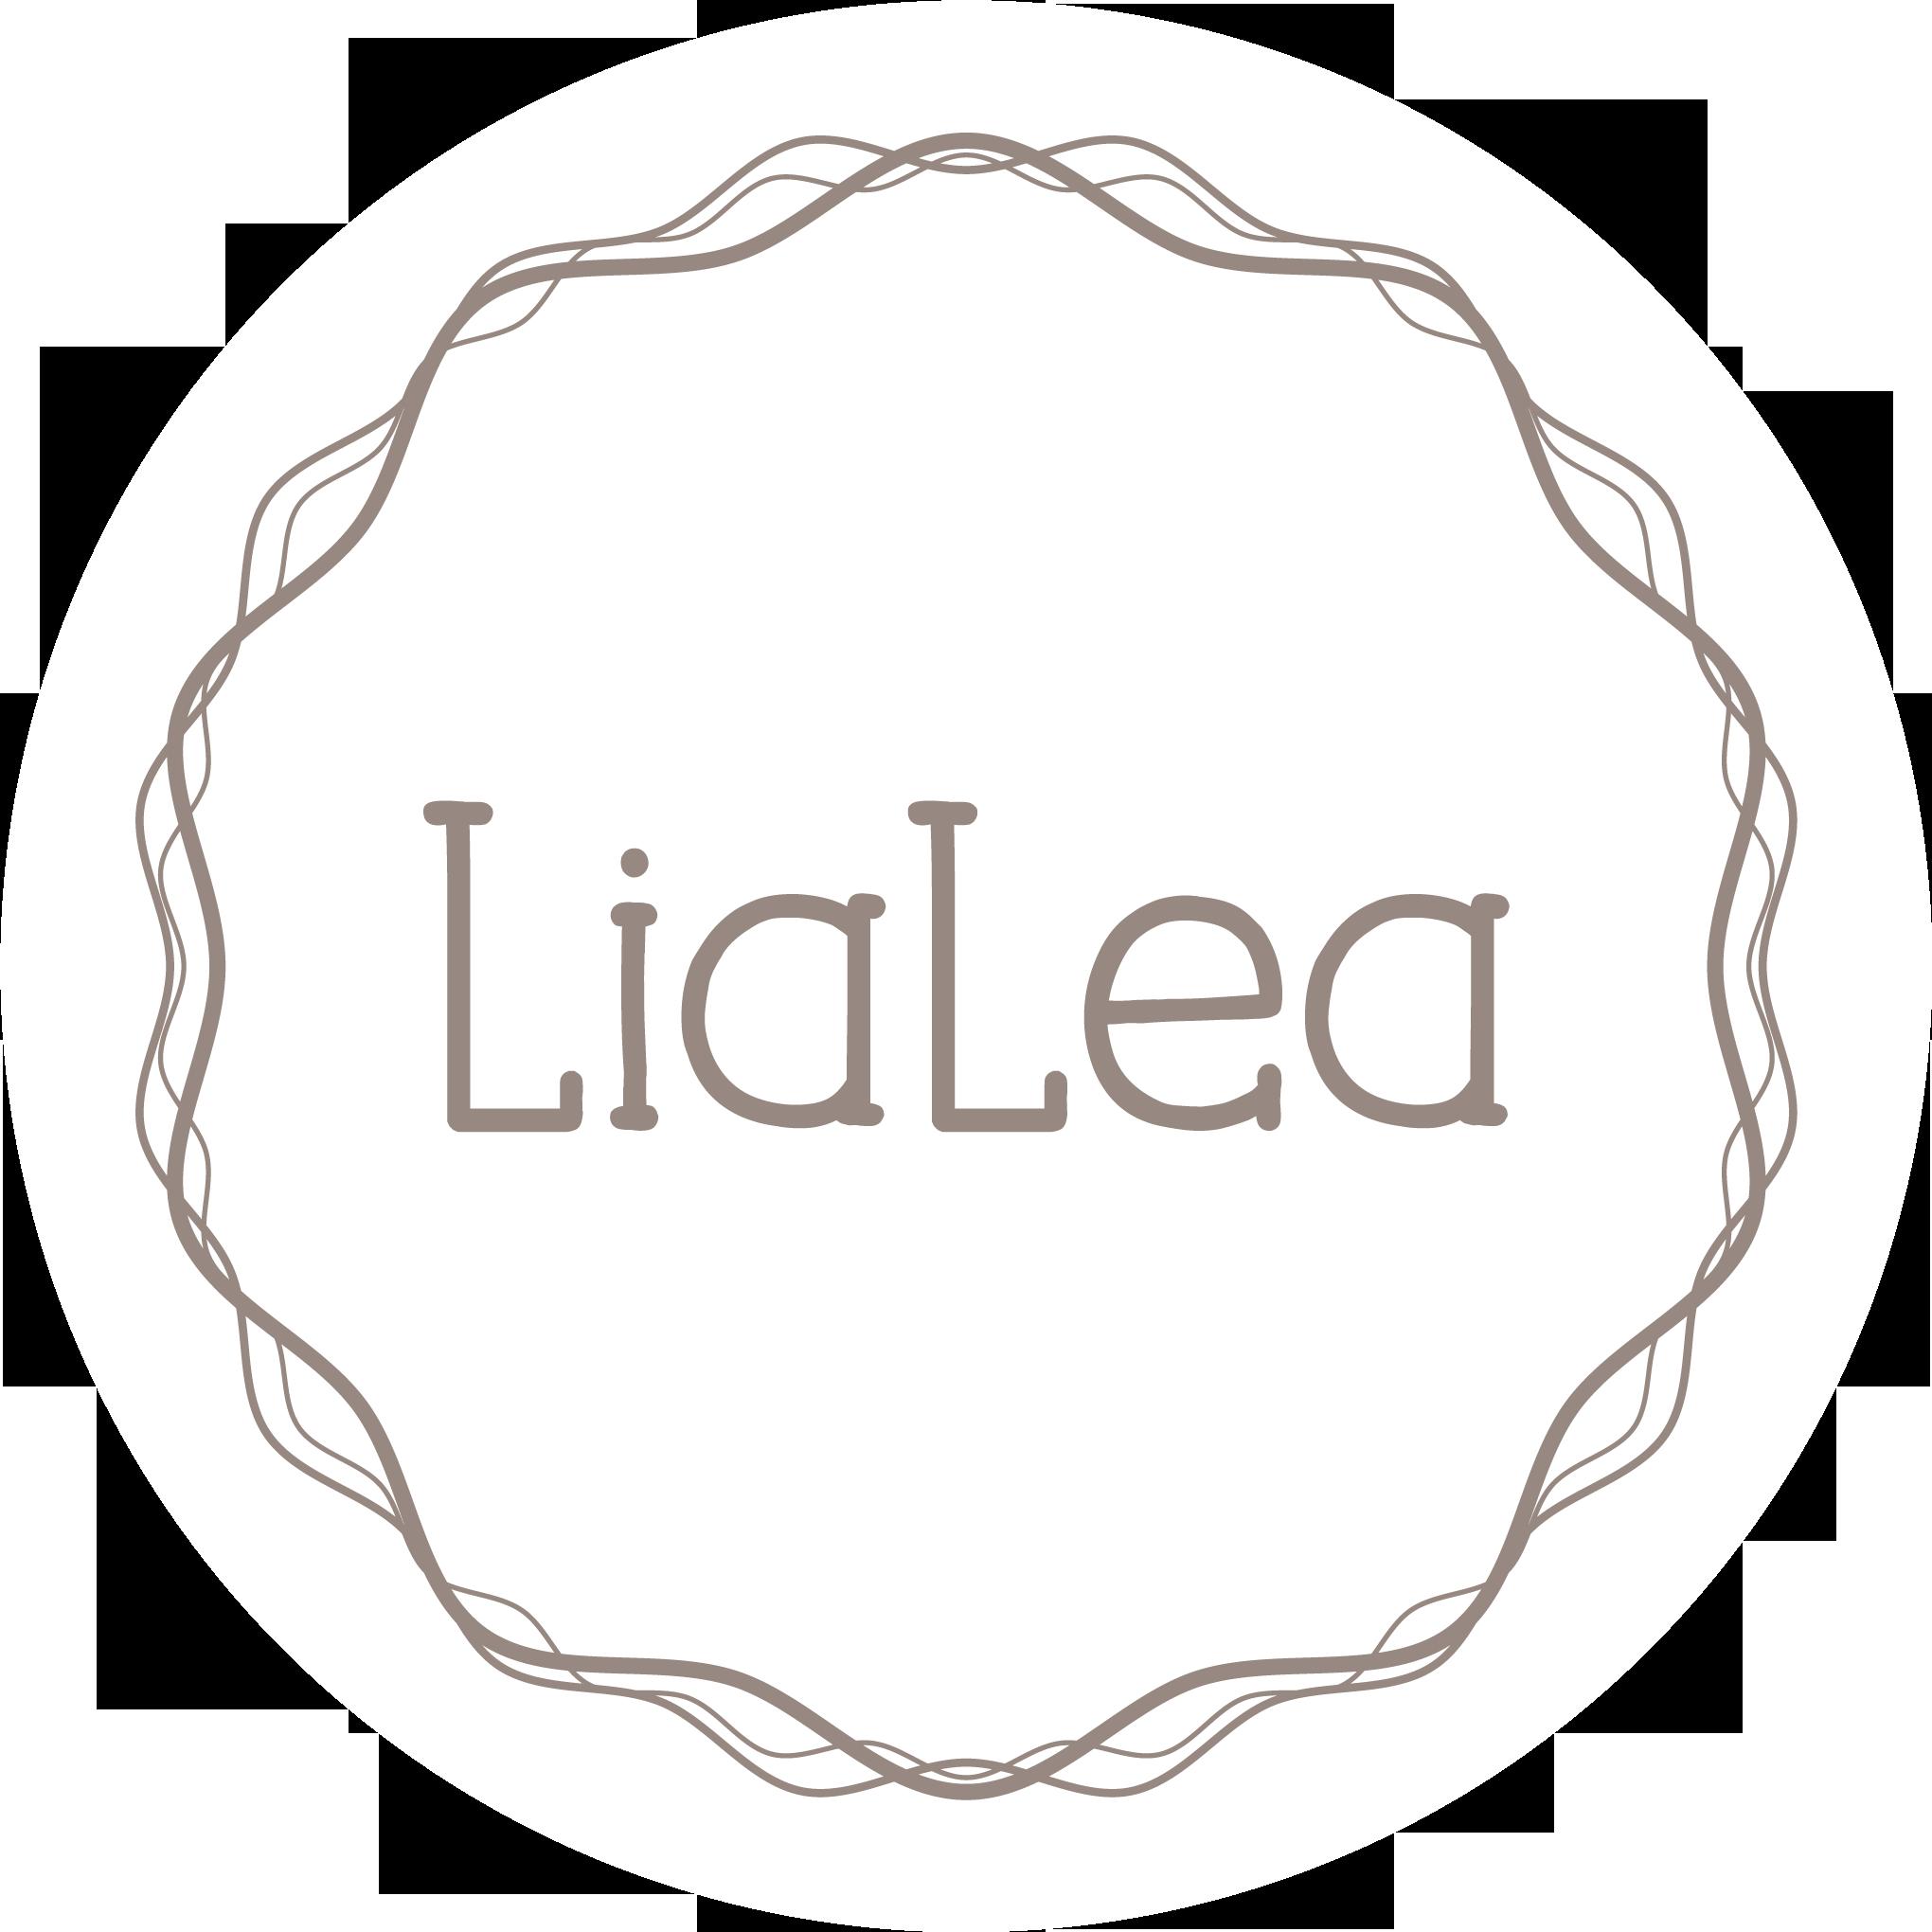 LiaLea